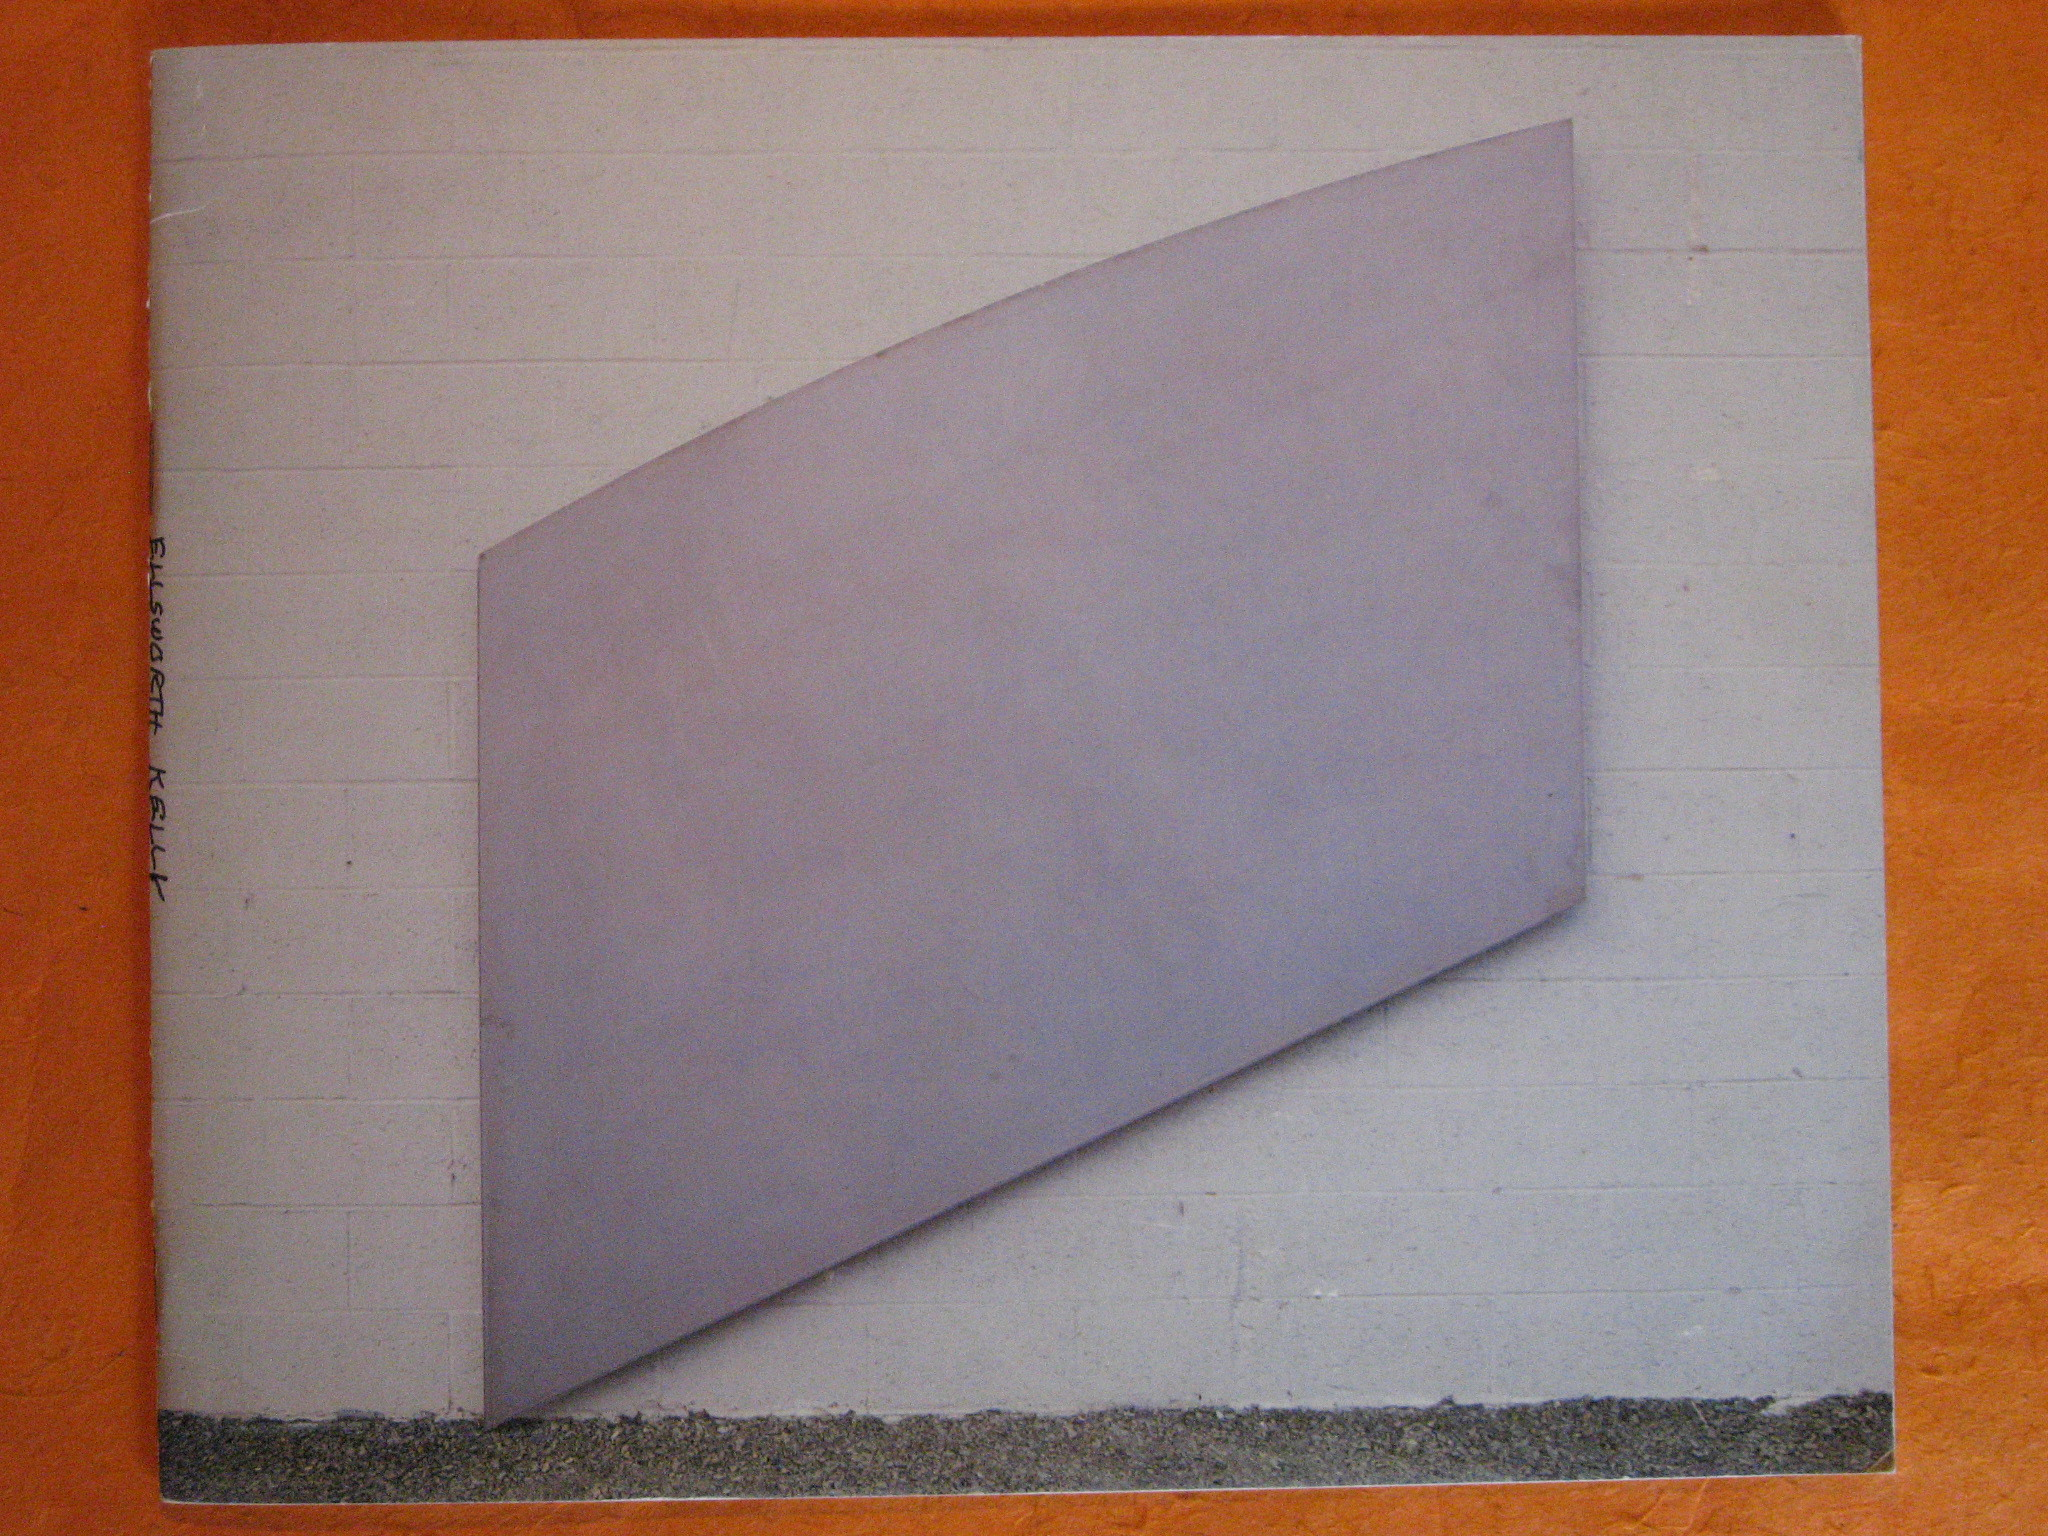 Ellsworth Kelly: Painted Aluminum Wall Sculpture and Weathering Steel Wall Sculpture, Kelly, Ellsworth